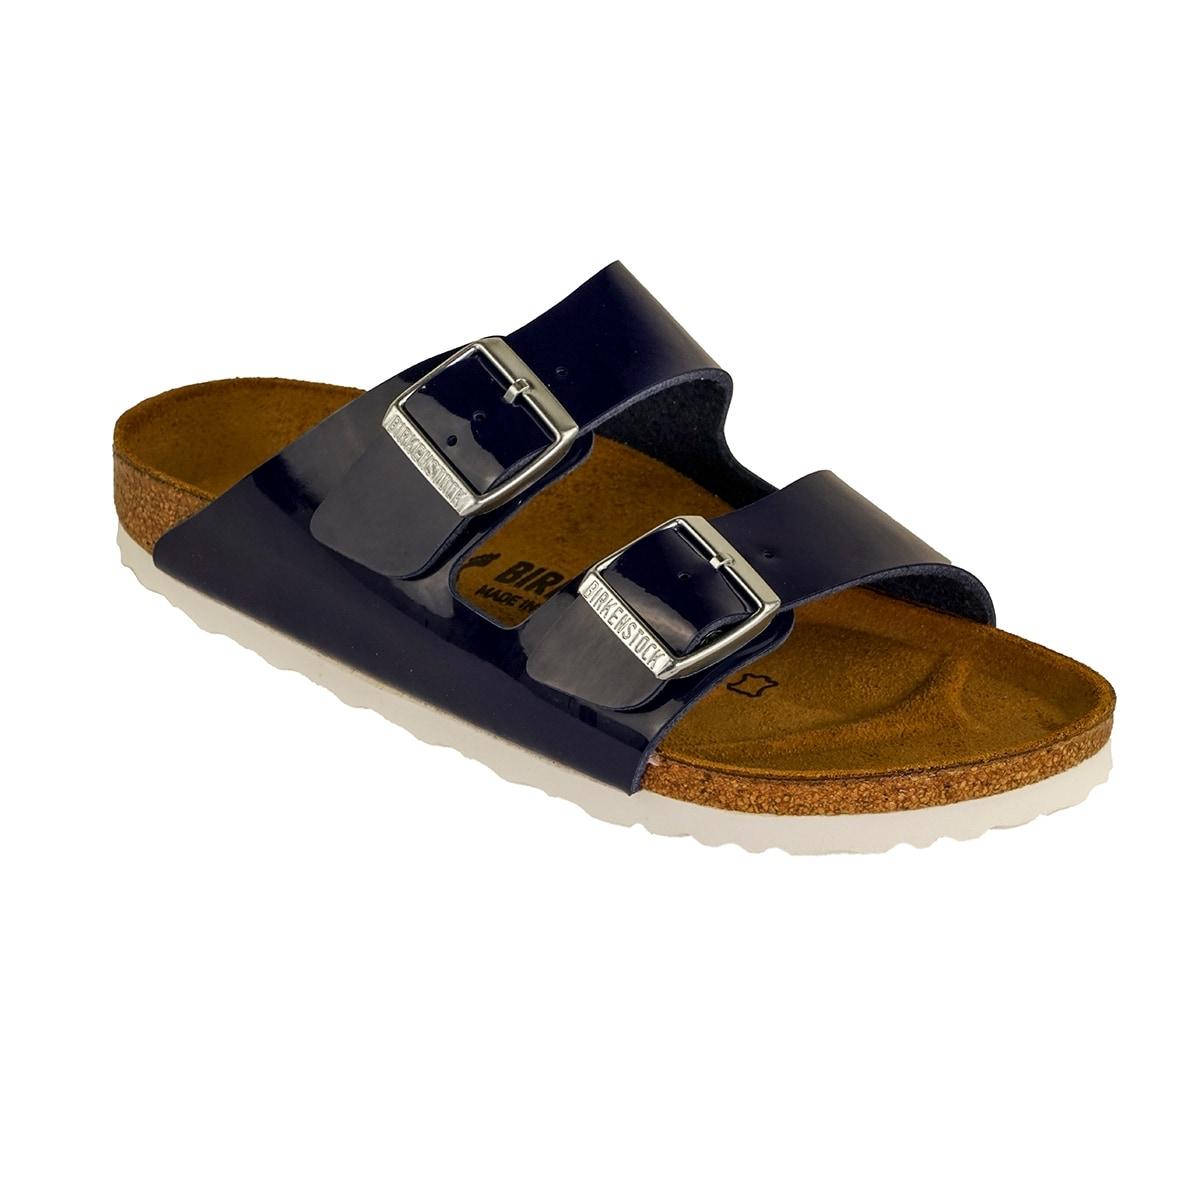 75d4fdec932cf1 Shop Birkenstock Arizona Birko-Flor Sandals - On Sale - Free Shipping Today  - Overstock - 23573056